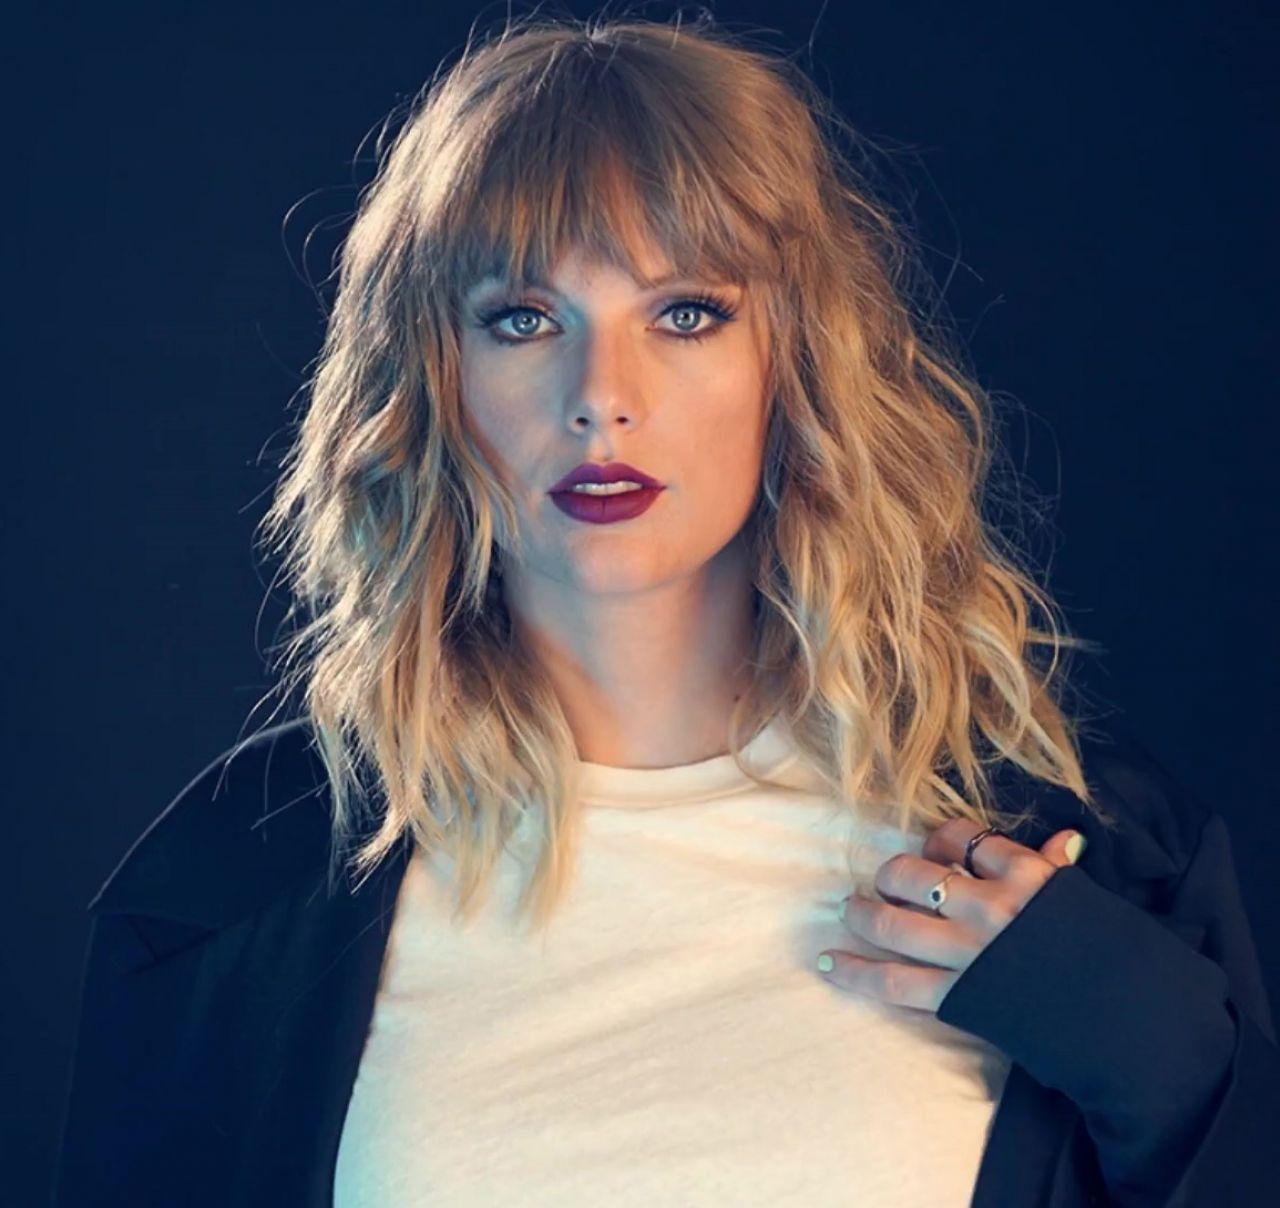 Taylor Swift Headshot Demi Lovato Song List